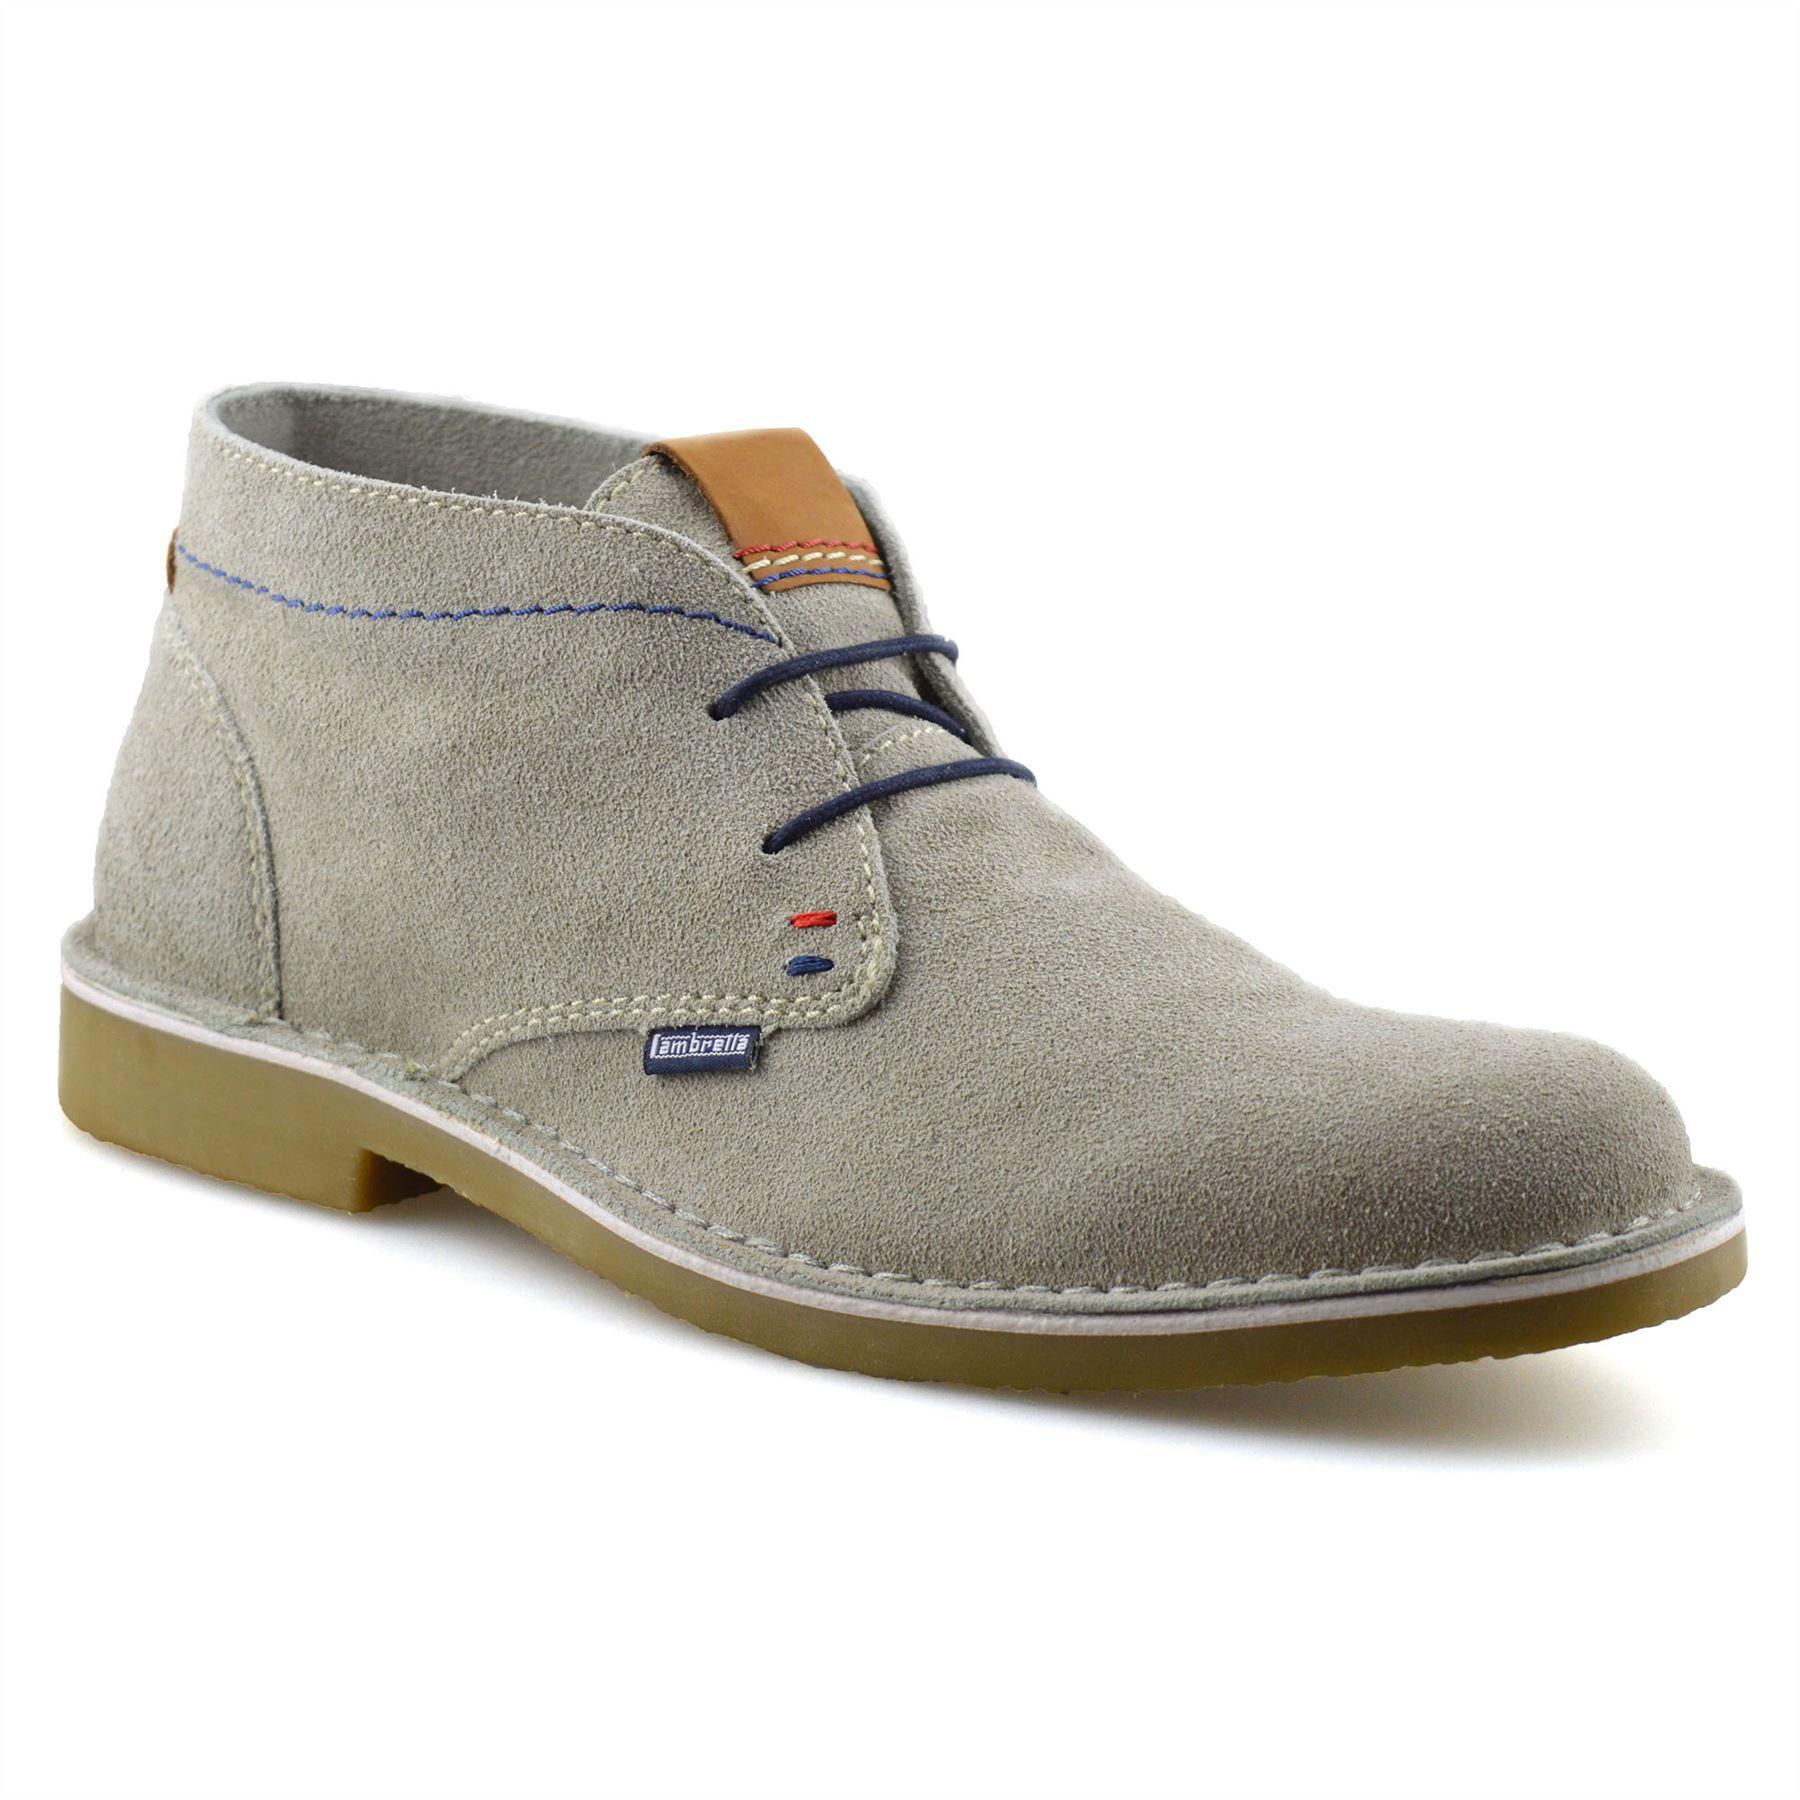 Homme-Lambretta-Cuir-Daim-Decontracte-Chukka-a-Lacets-Desert-Bottes-Chaussures-Taille miniature 7